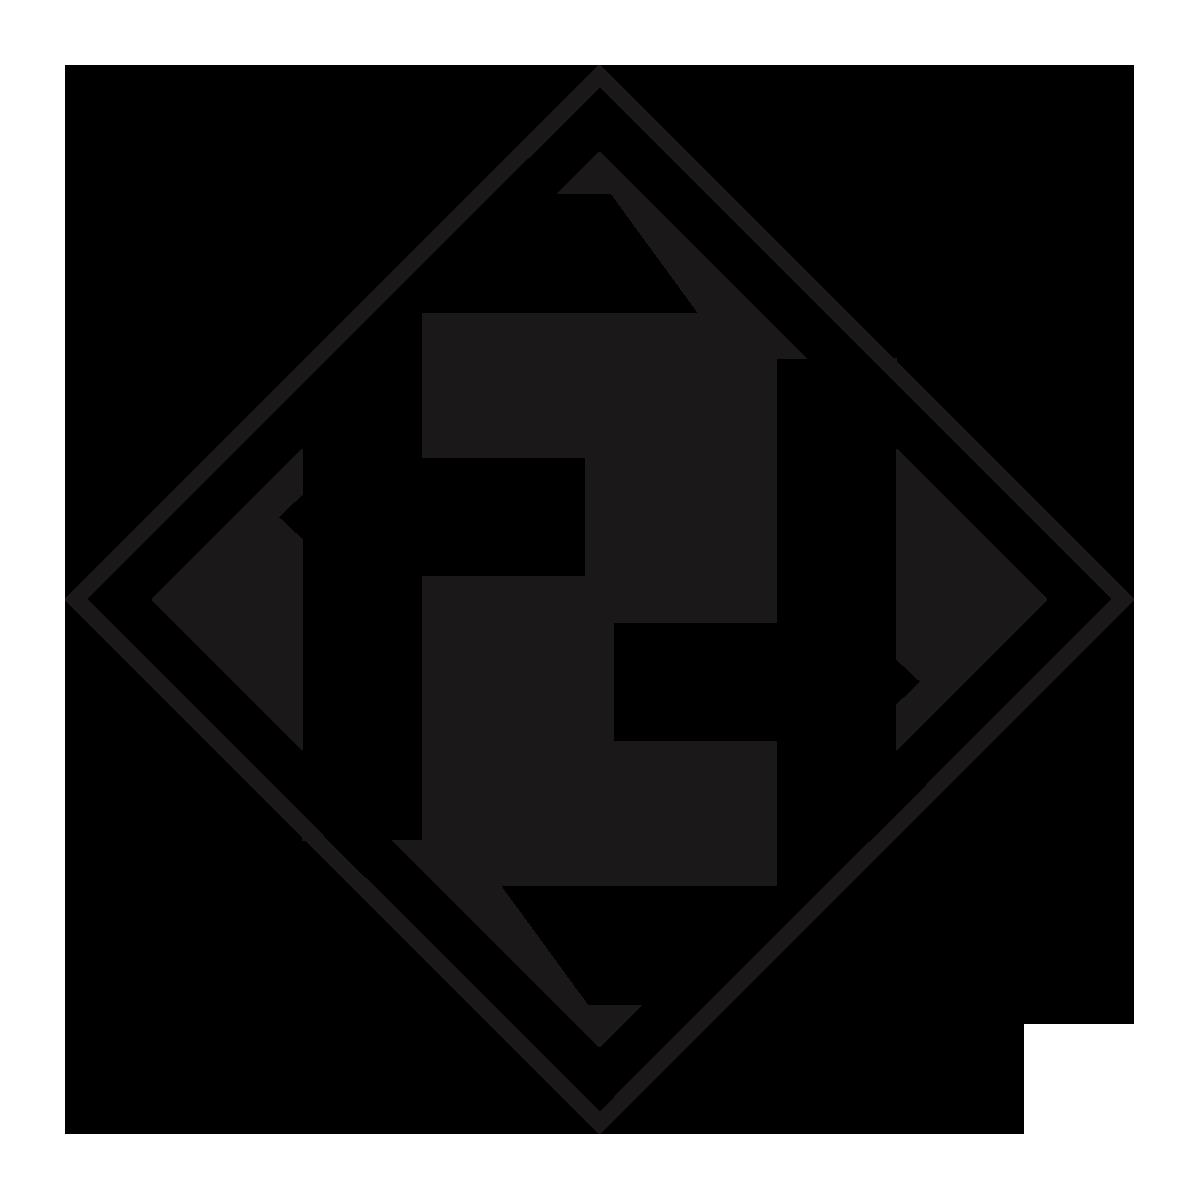 F2F_blk high resolution logo.png